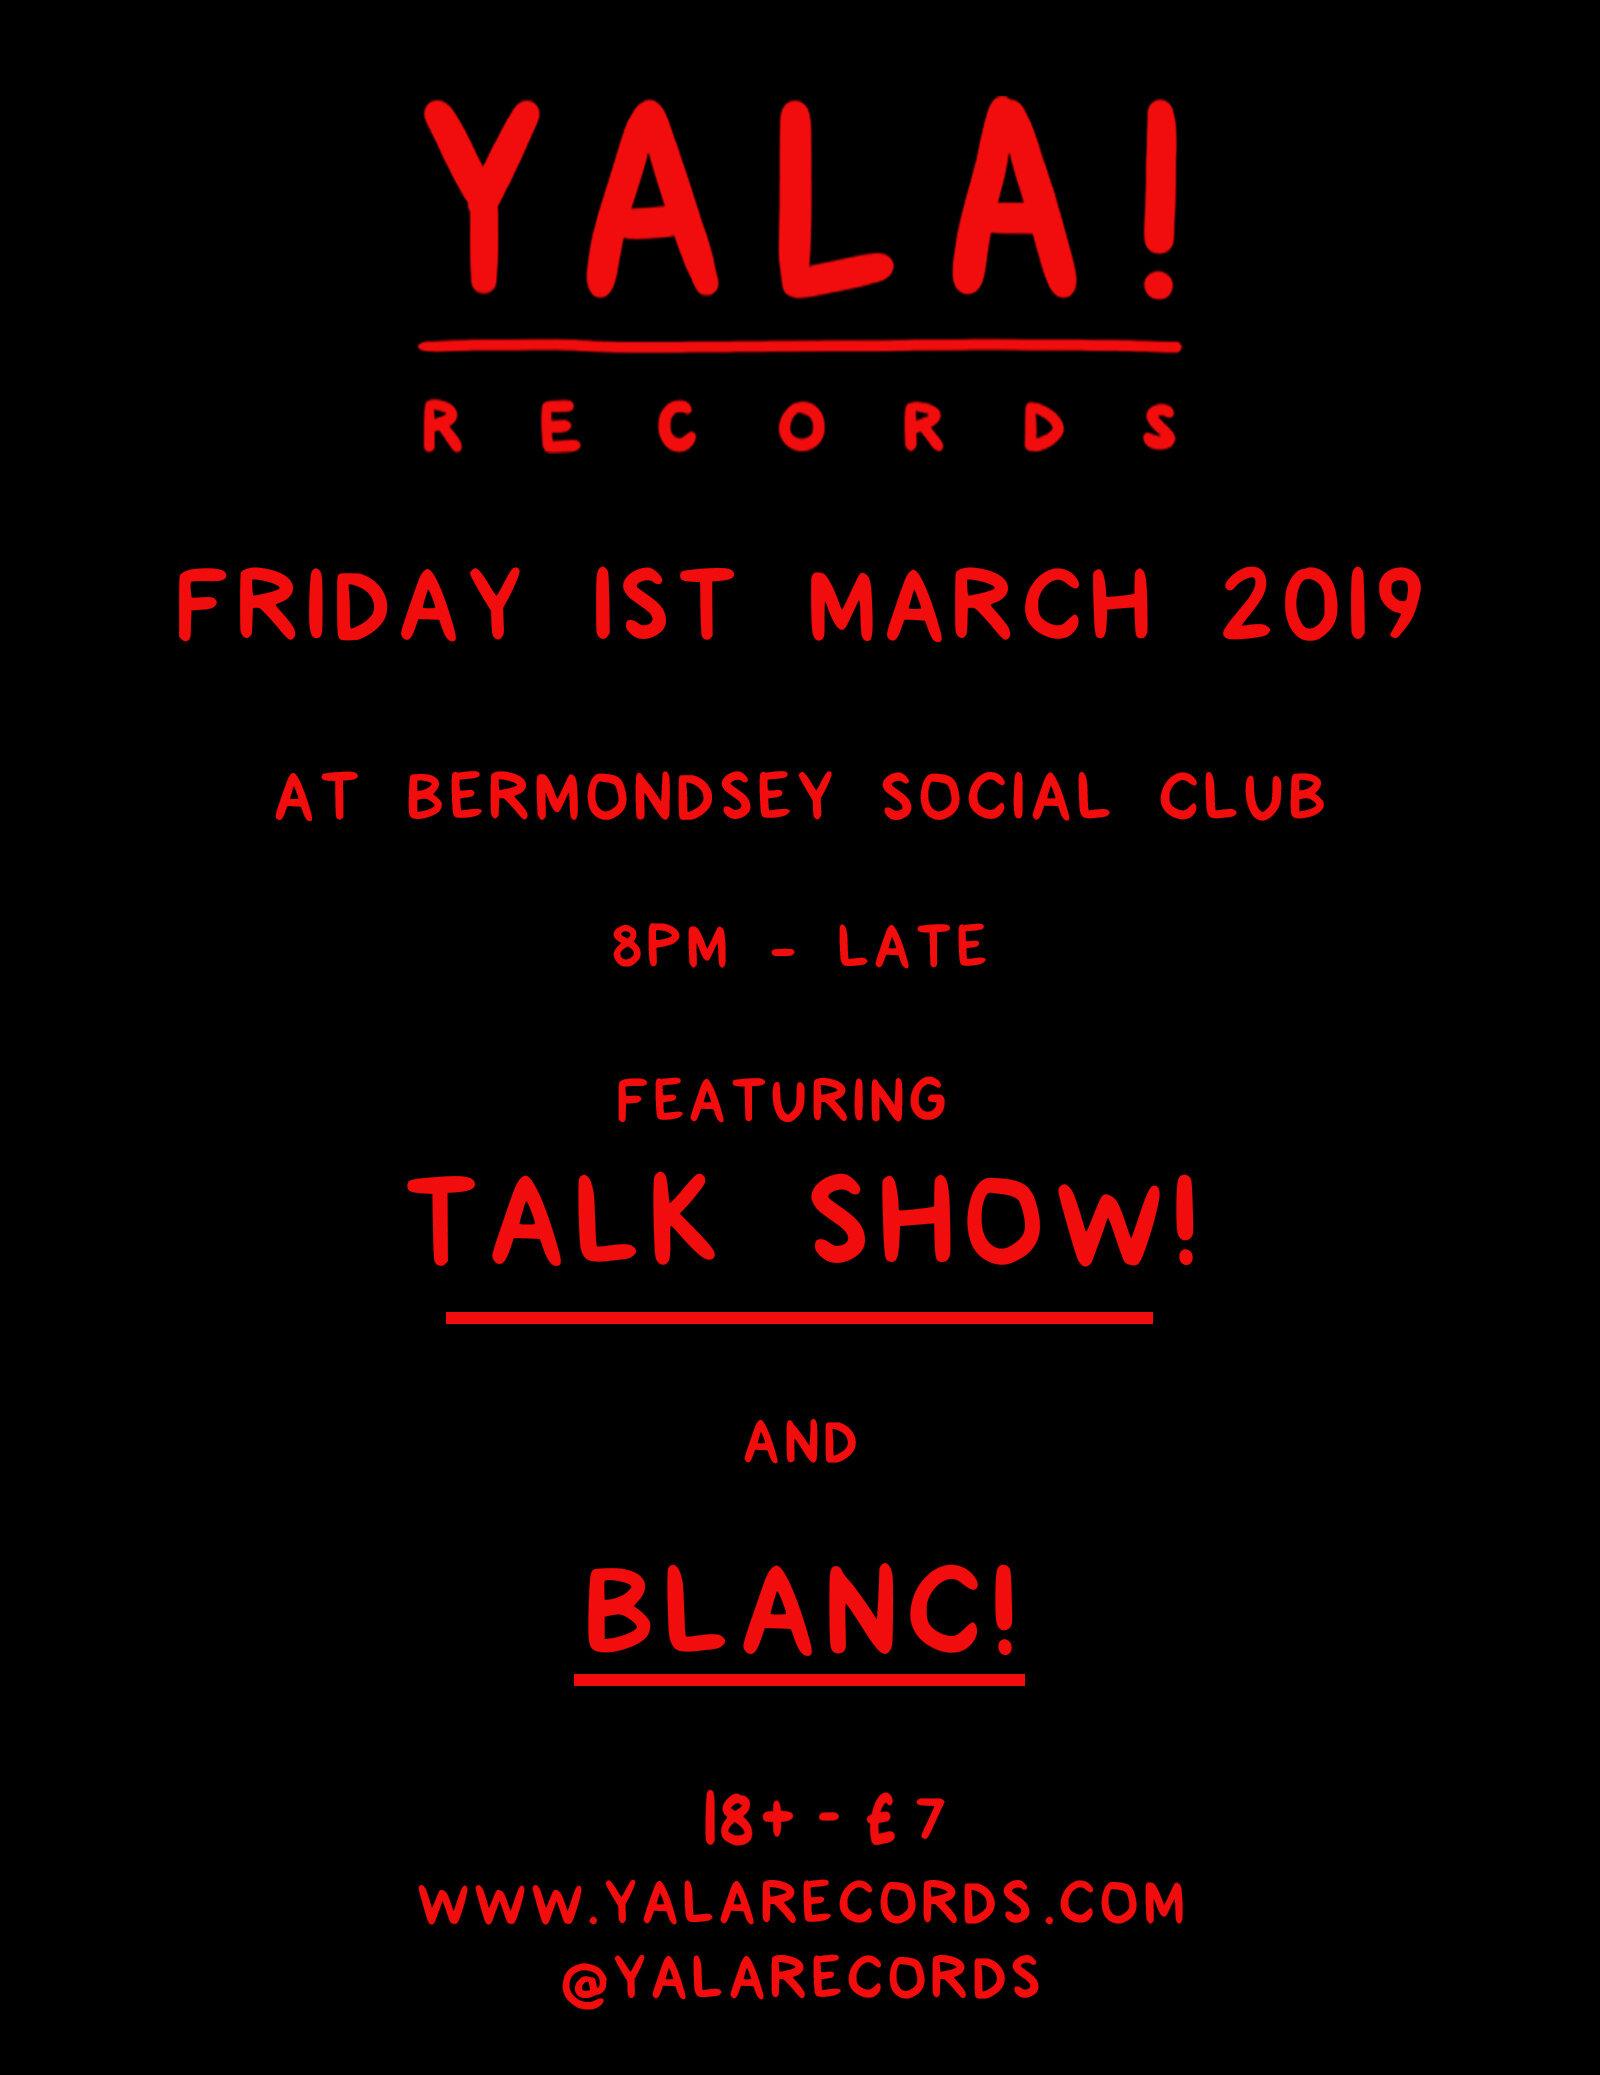 Talk show blanc london poster.jpg